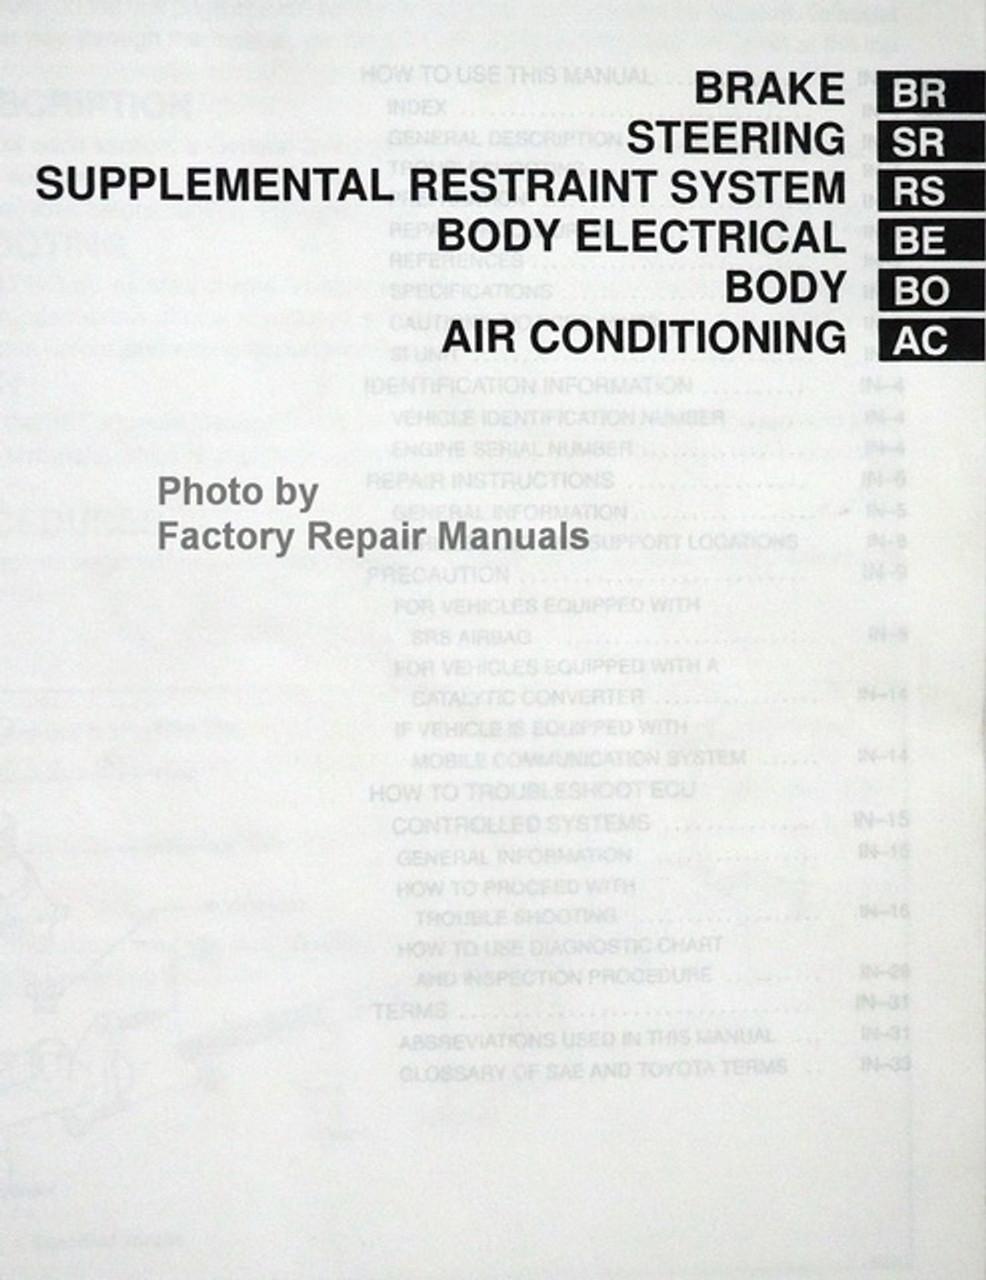 1996 Toyota 4Runner Factory Service Manual Original Shop